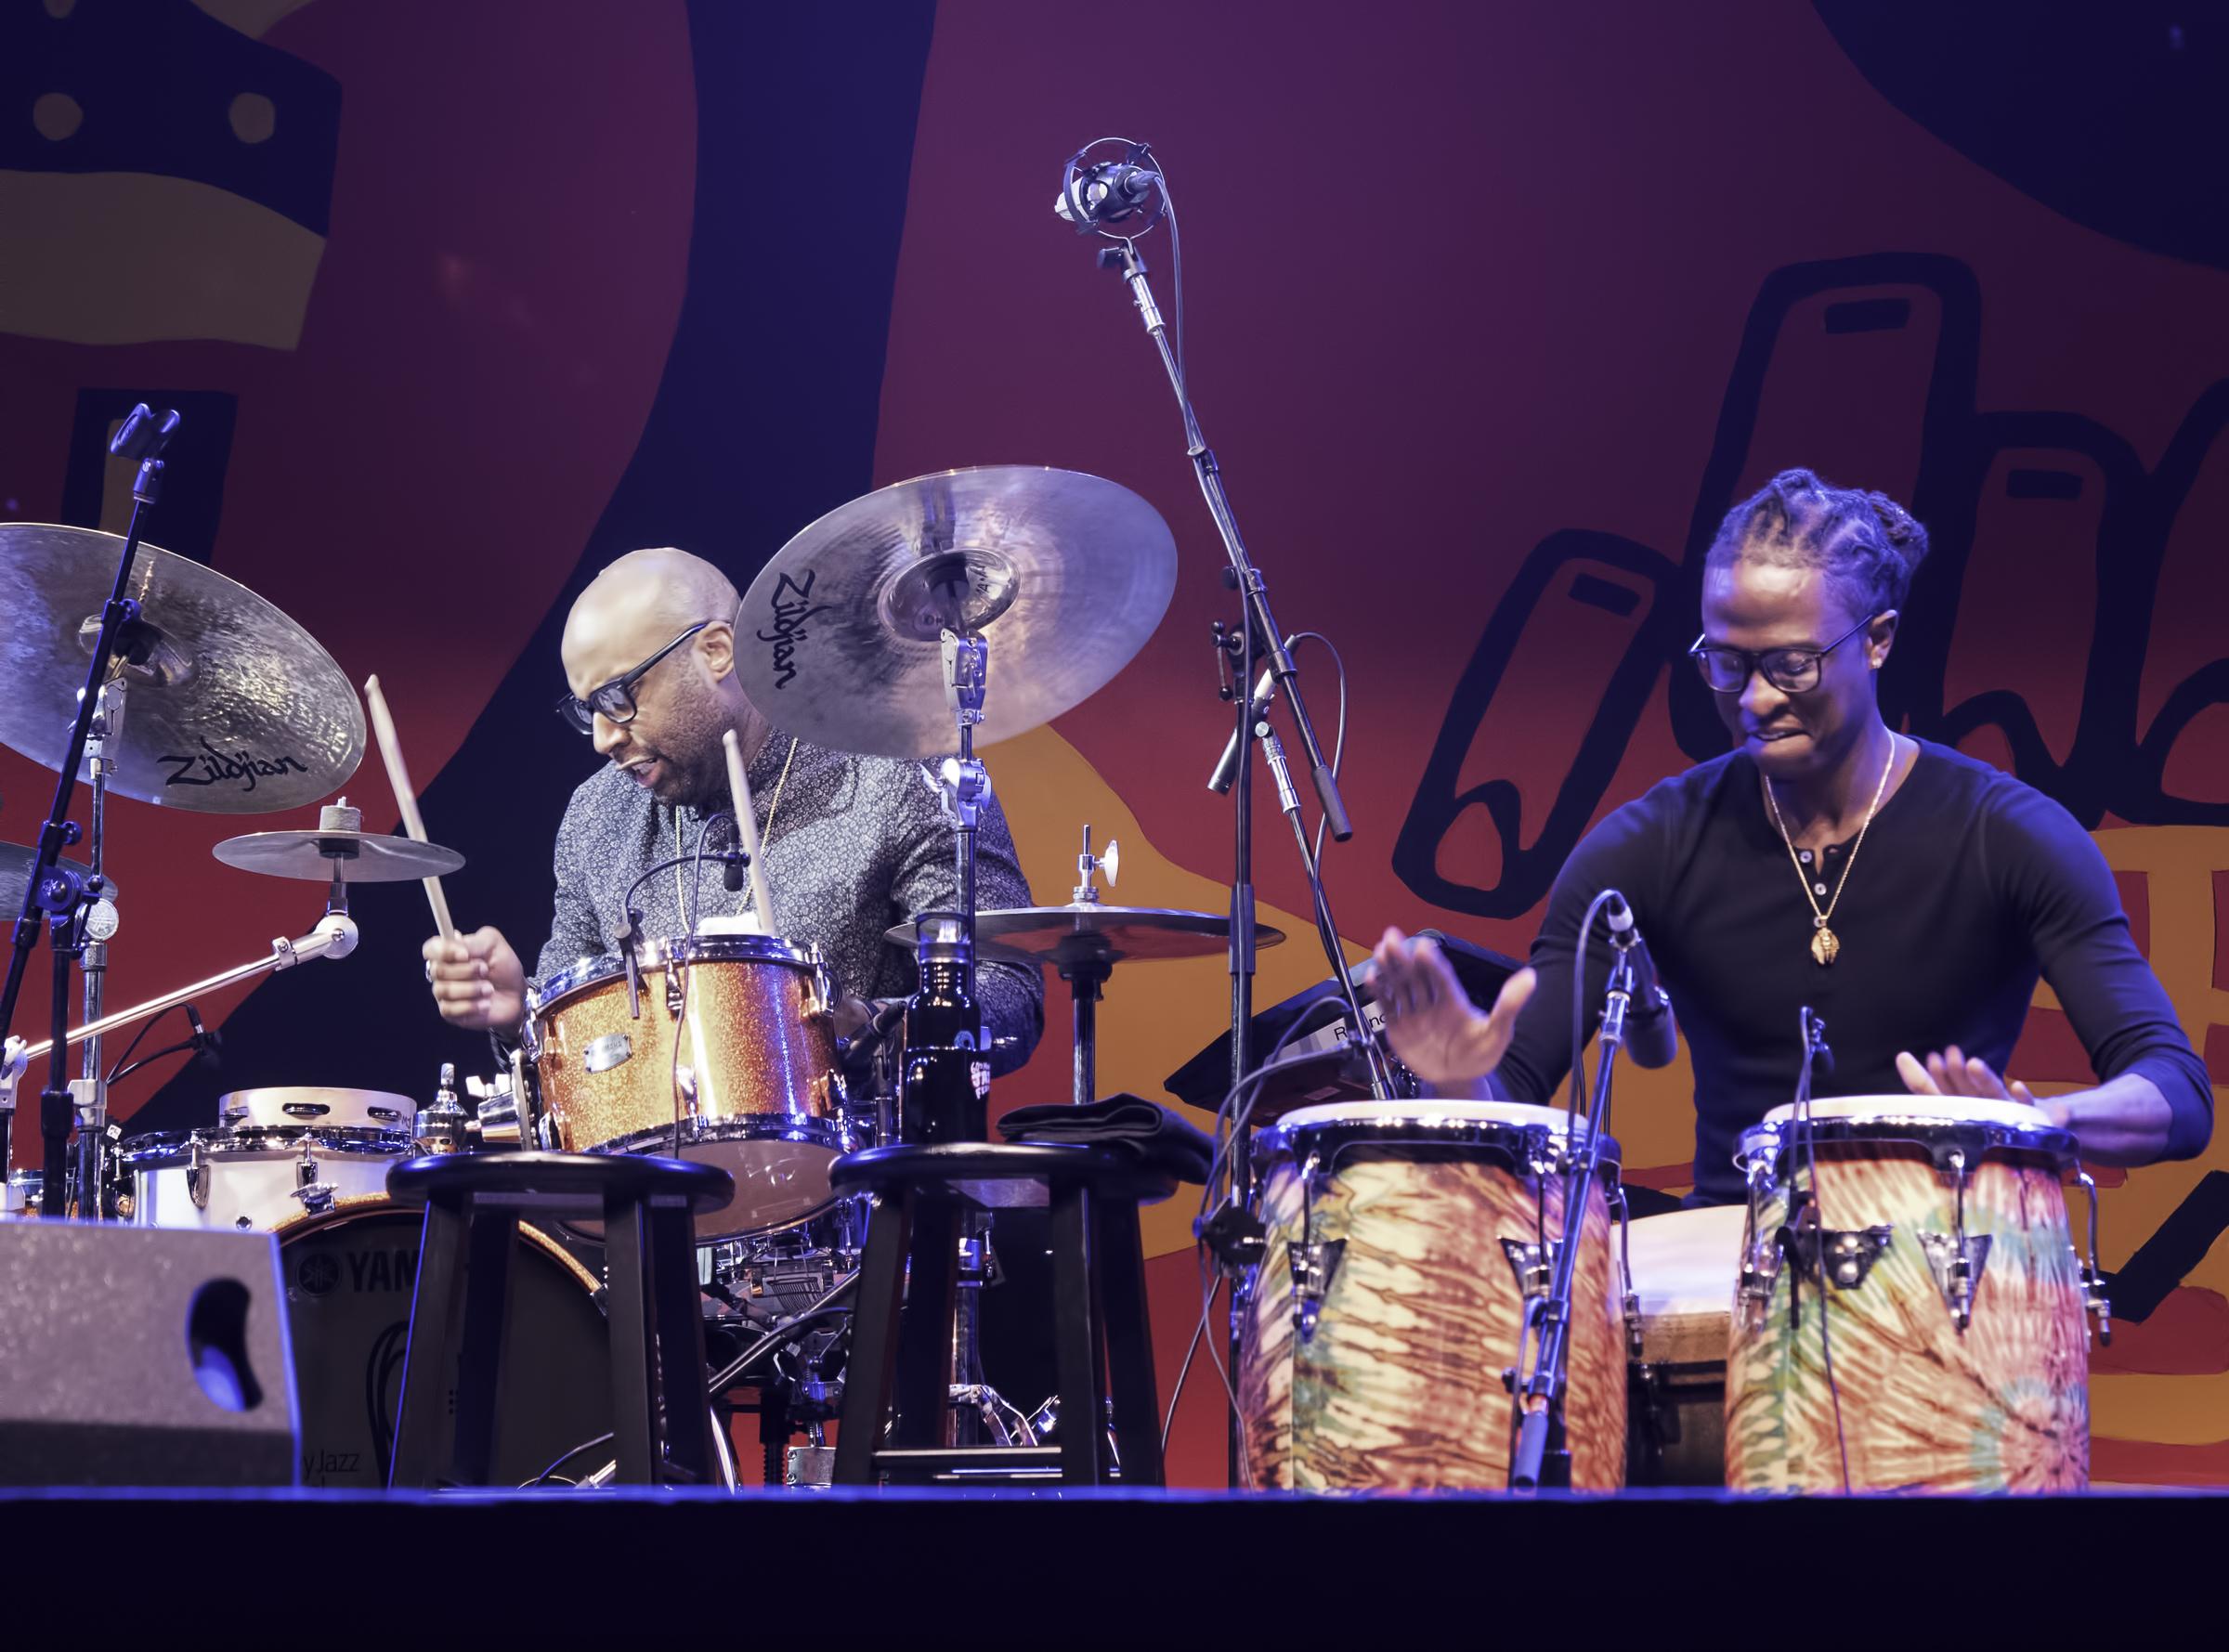 John Davis and Senfuab Stoney with Leslie Odom Jr. at the Monterey Jazz Festival